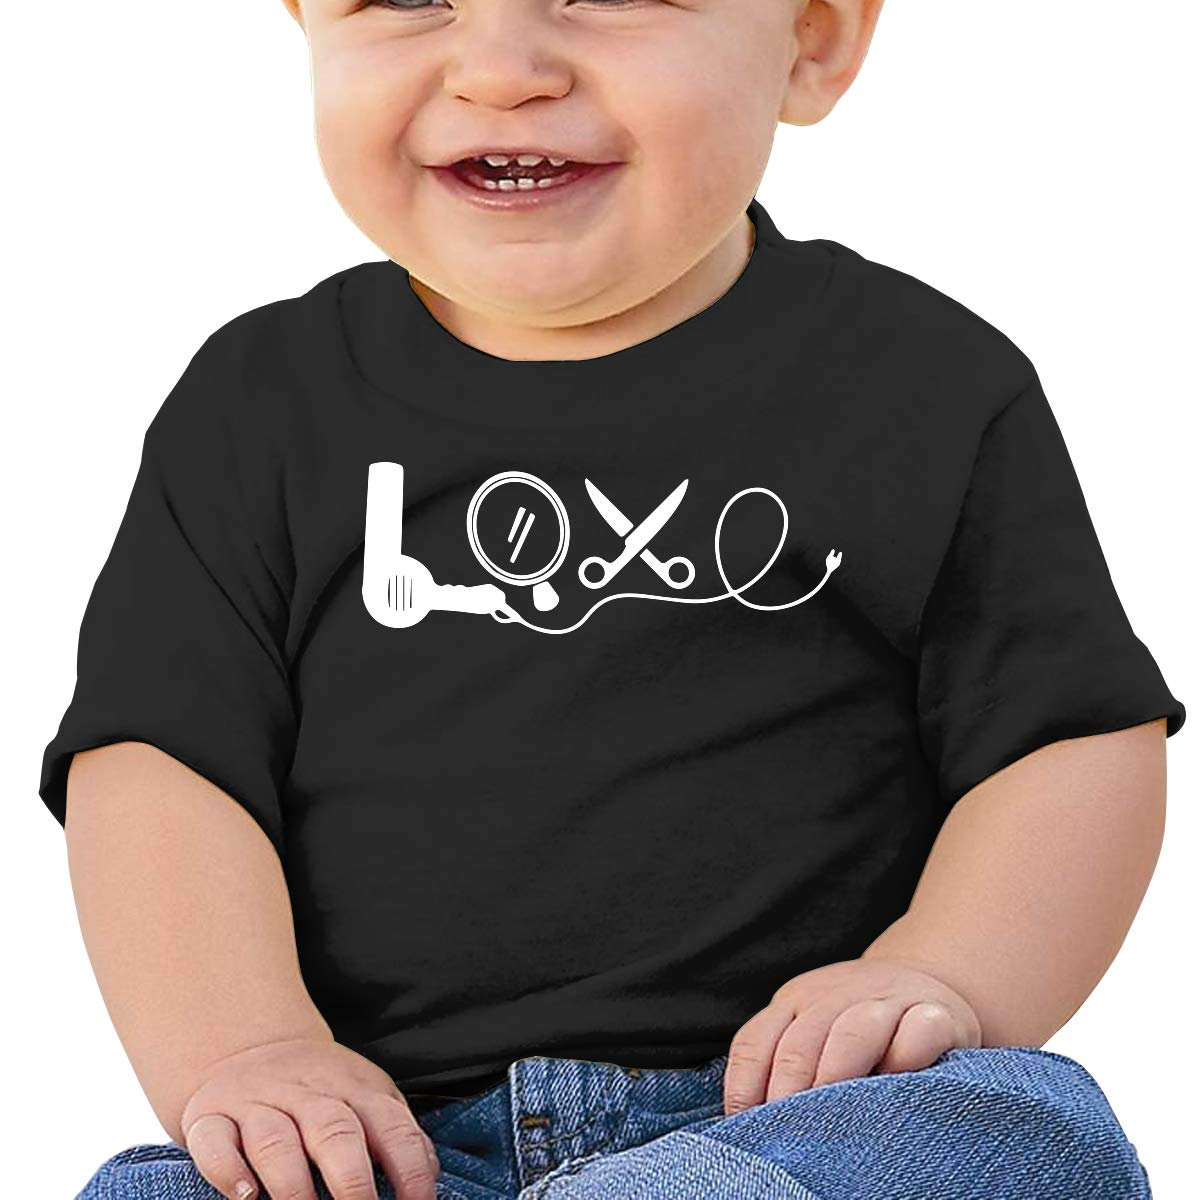 Hair Stylist Love-1 Baby Boys Girls Short Sleeve Crewneck T-Shirt 6-18 Month Tops